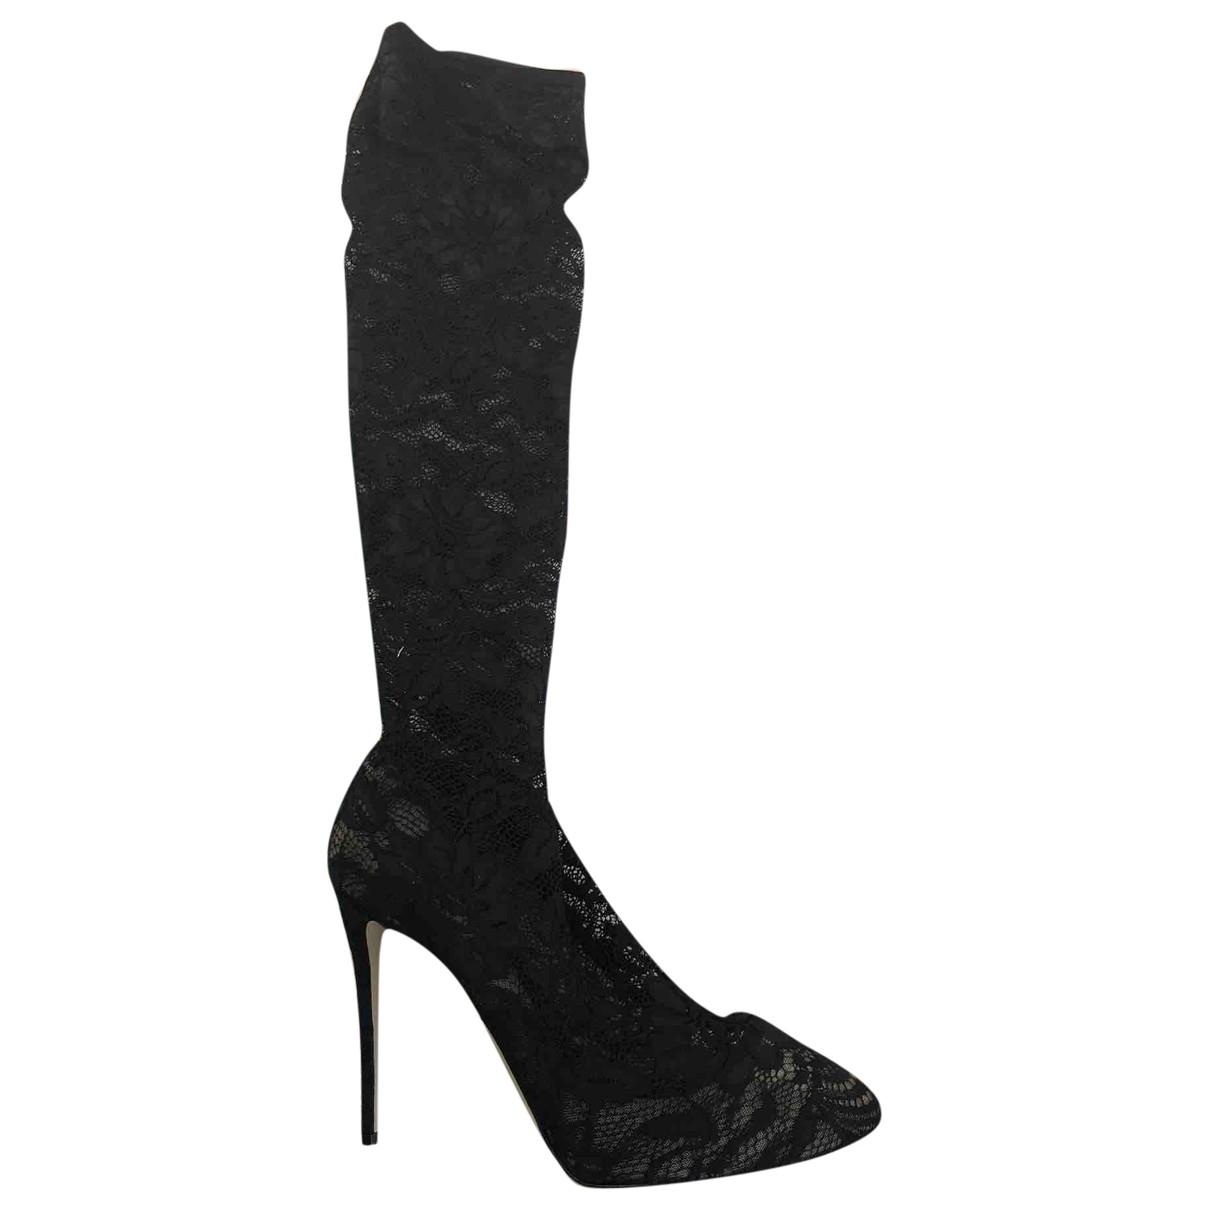 Dolce & Gabbana \N Black Cloth Boots for Women 41 EU